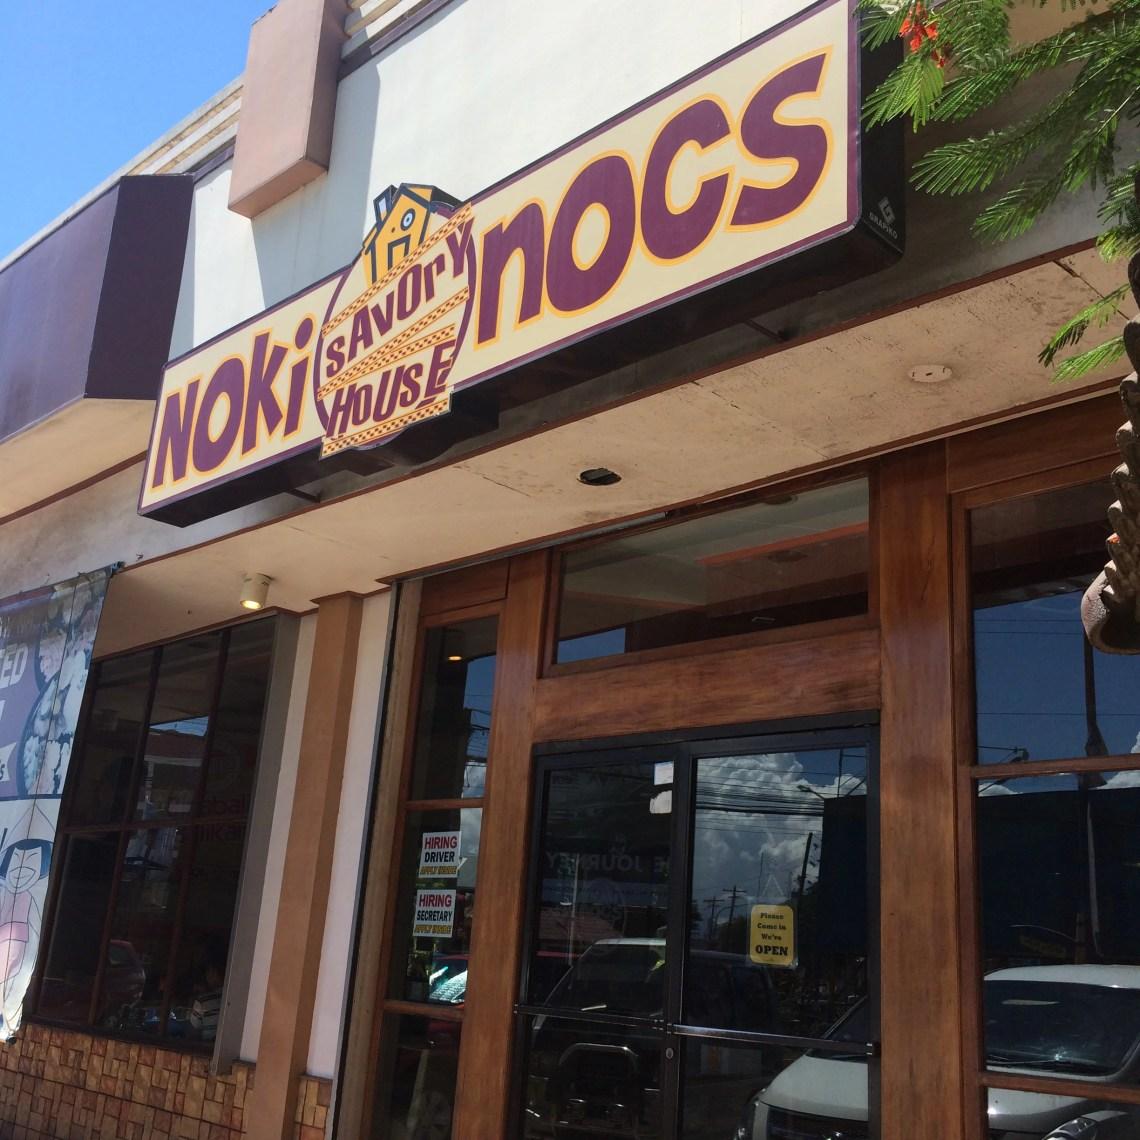 Puerto Princesa - Nokinocs